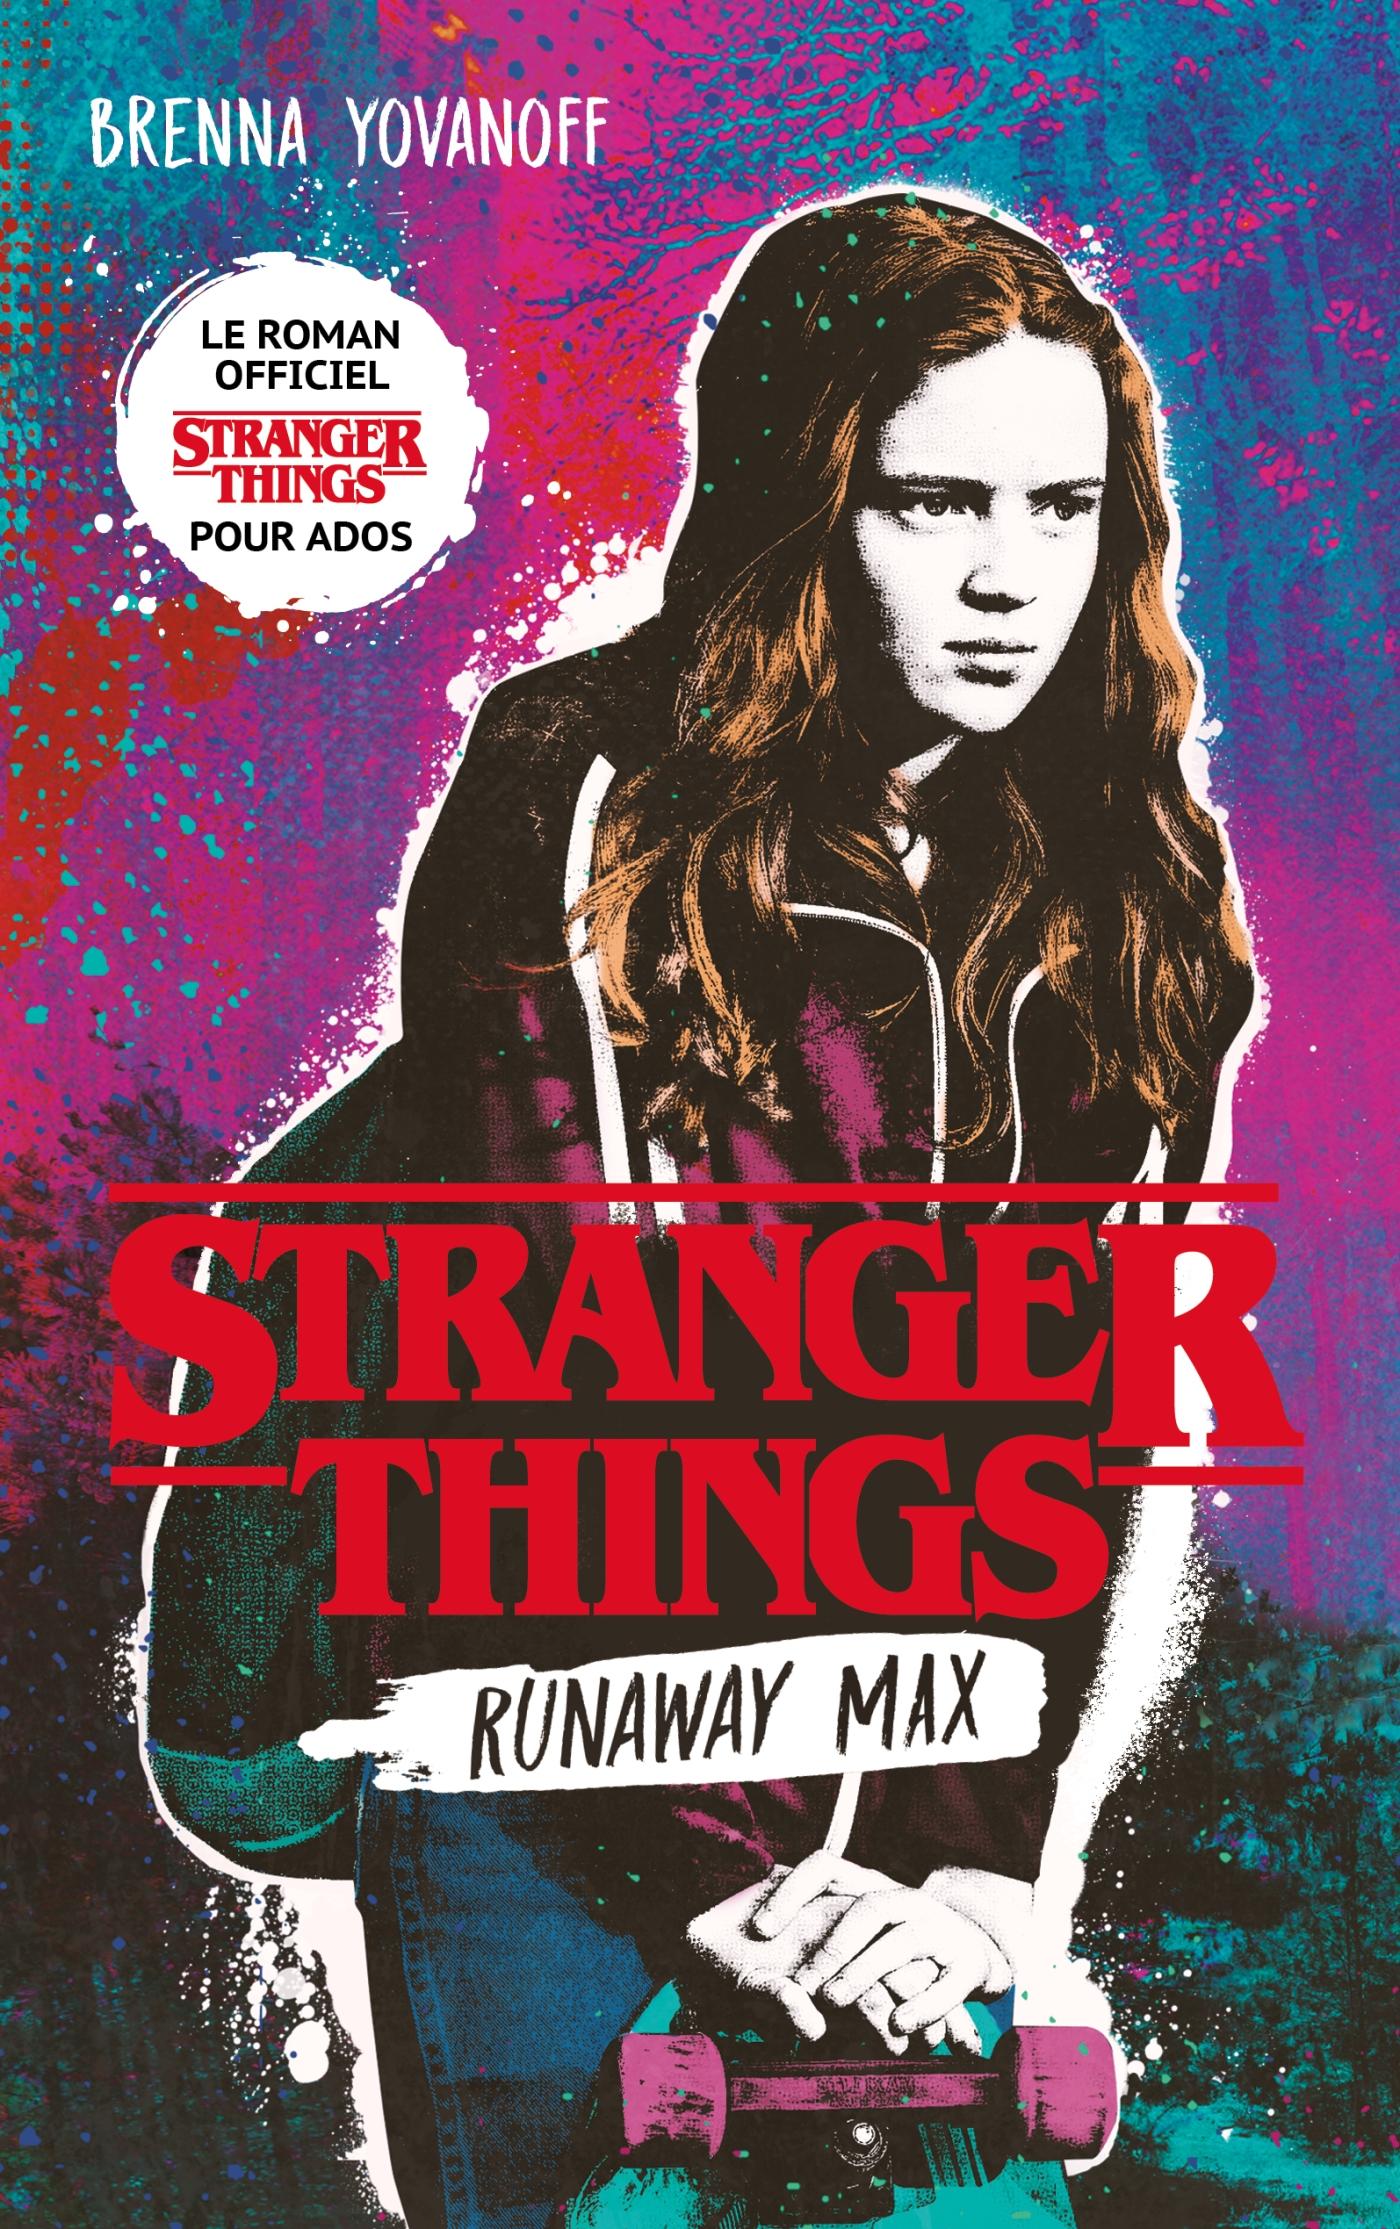 Stranger Things - Runaway Max - Le roman officiel pour ados | Yovanoff, Brenna. Auteur